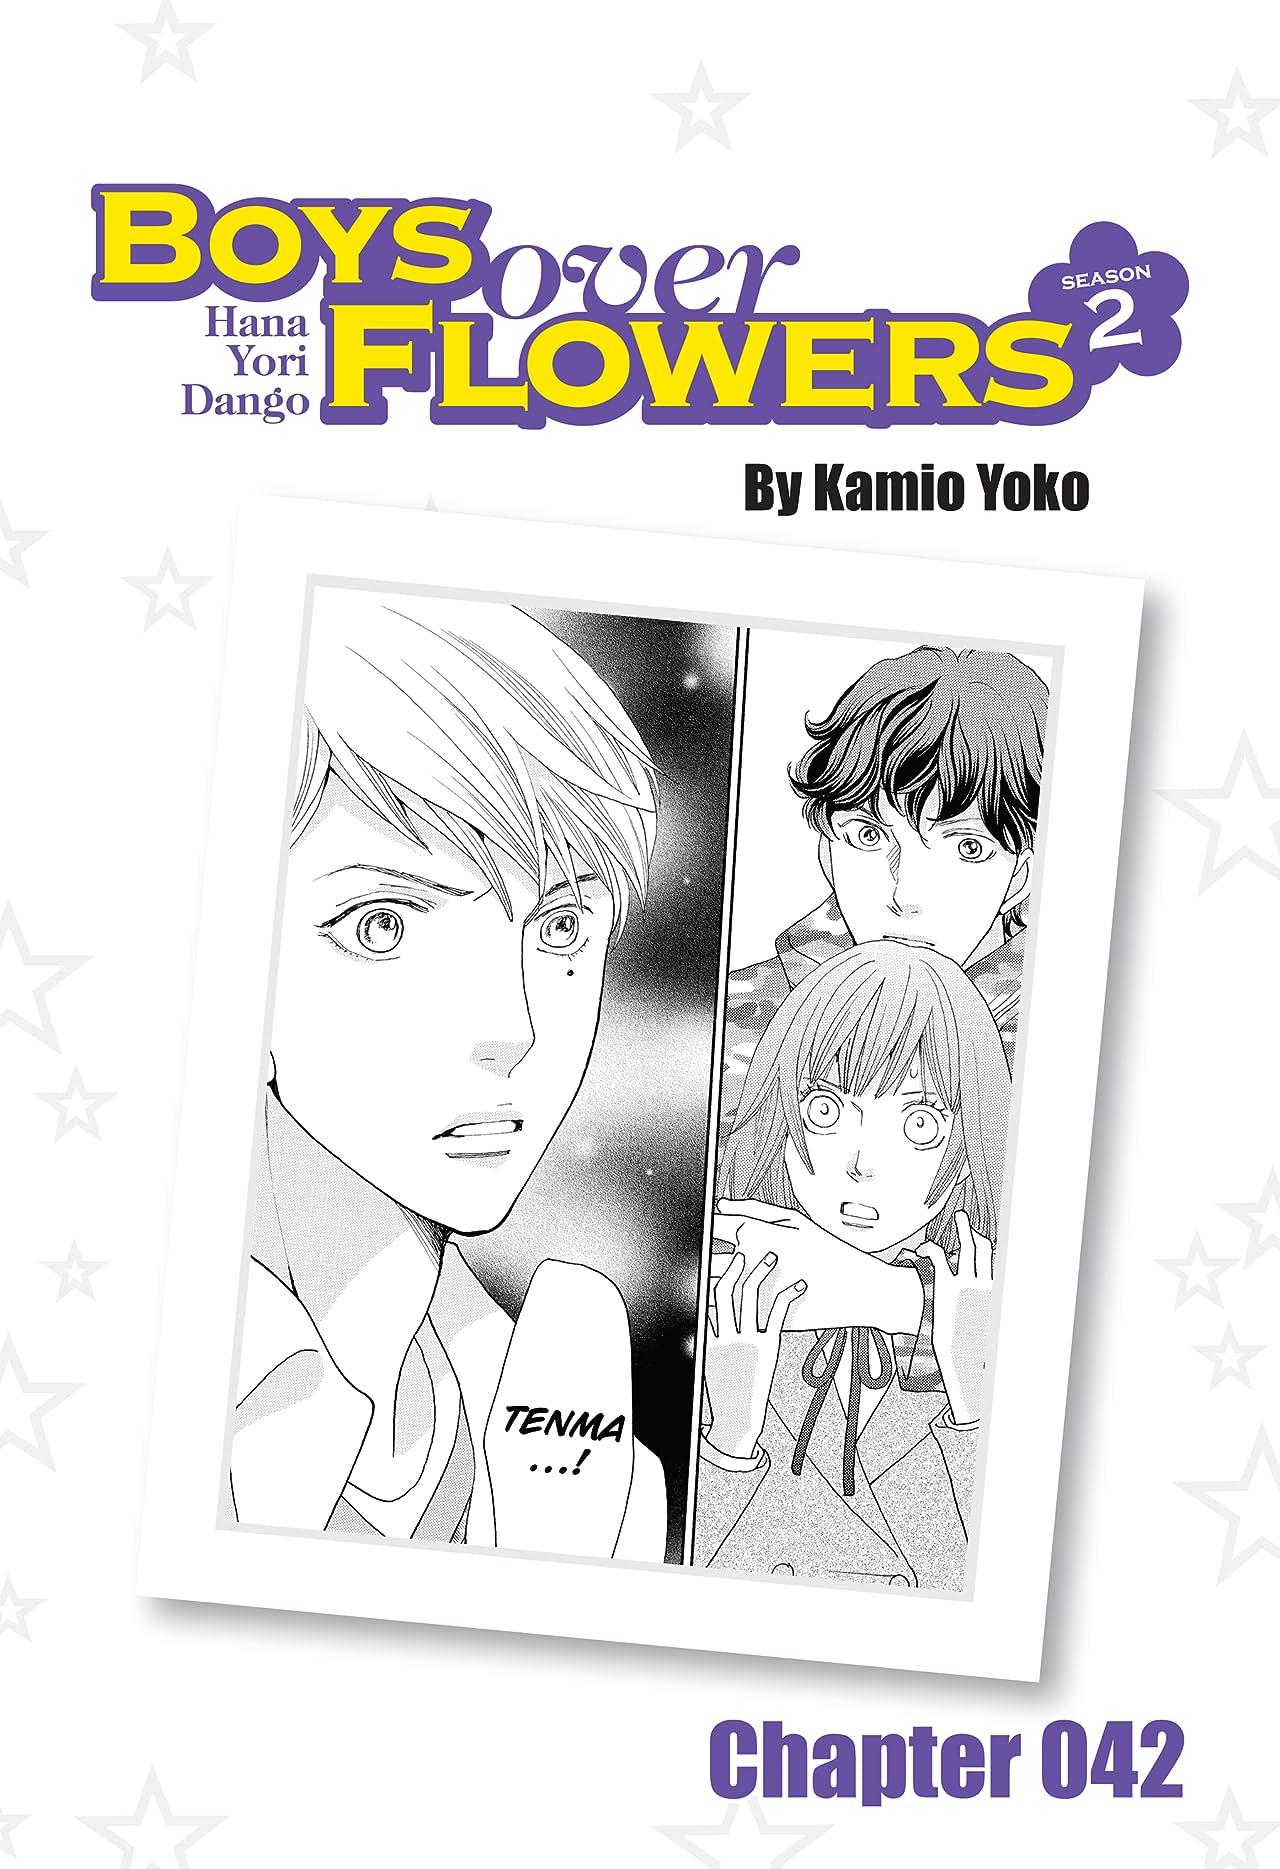 Boys Over Flowers Season 2: Chapter 42